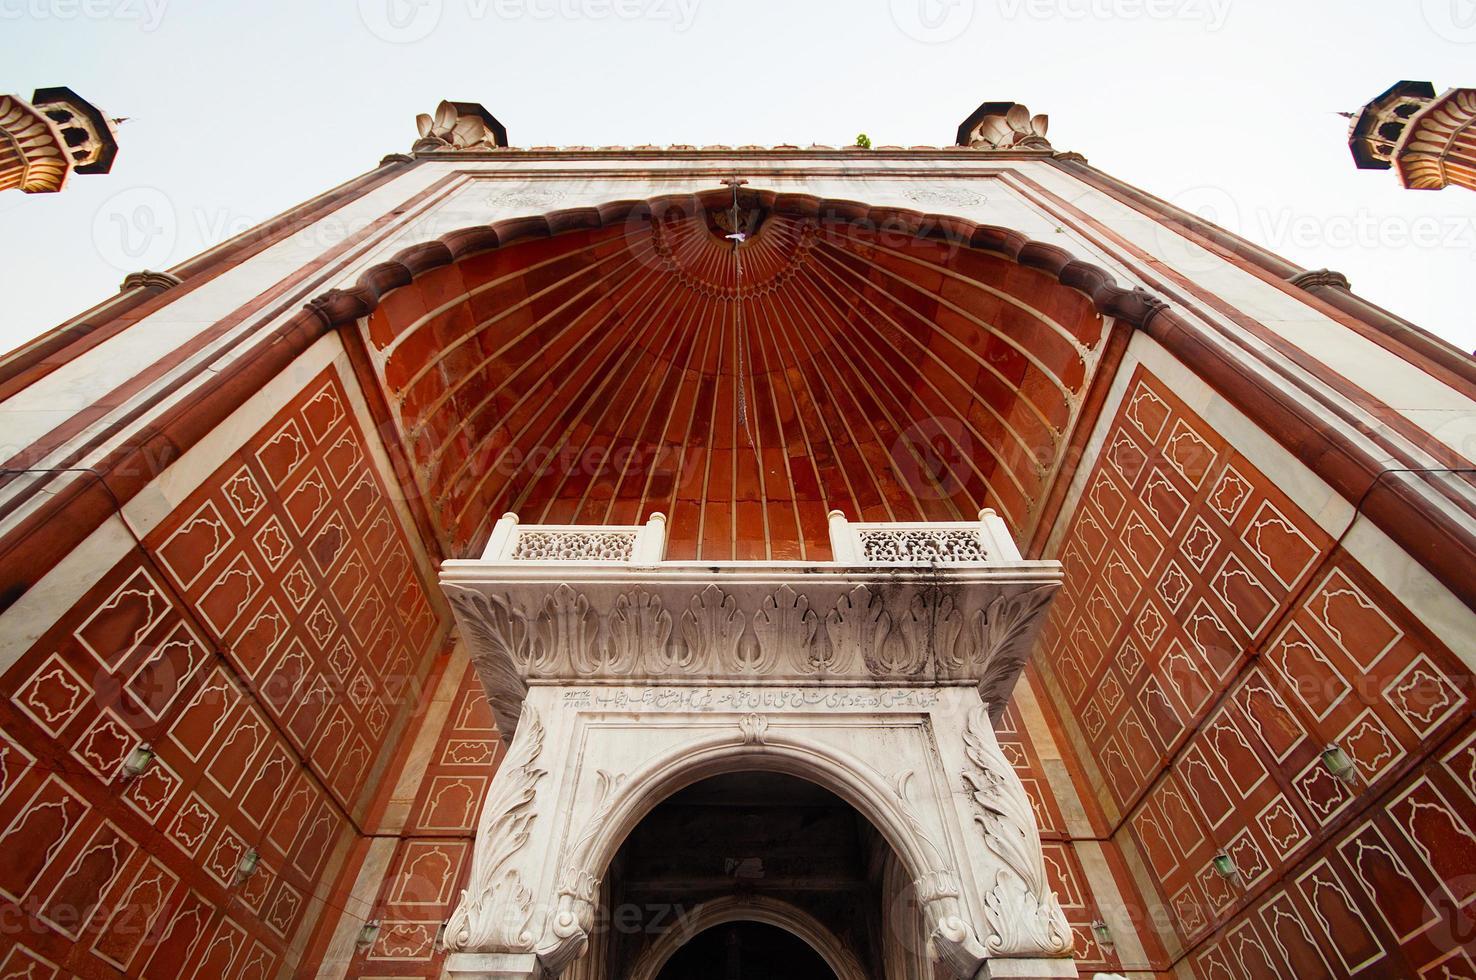 jama masjid moskee, oude delhi, india foto